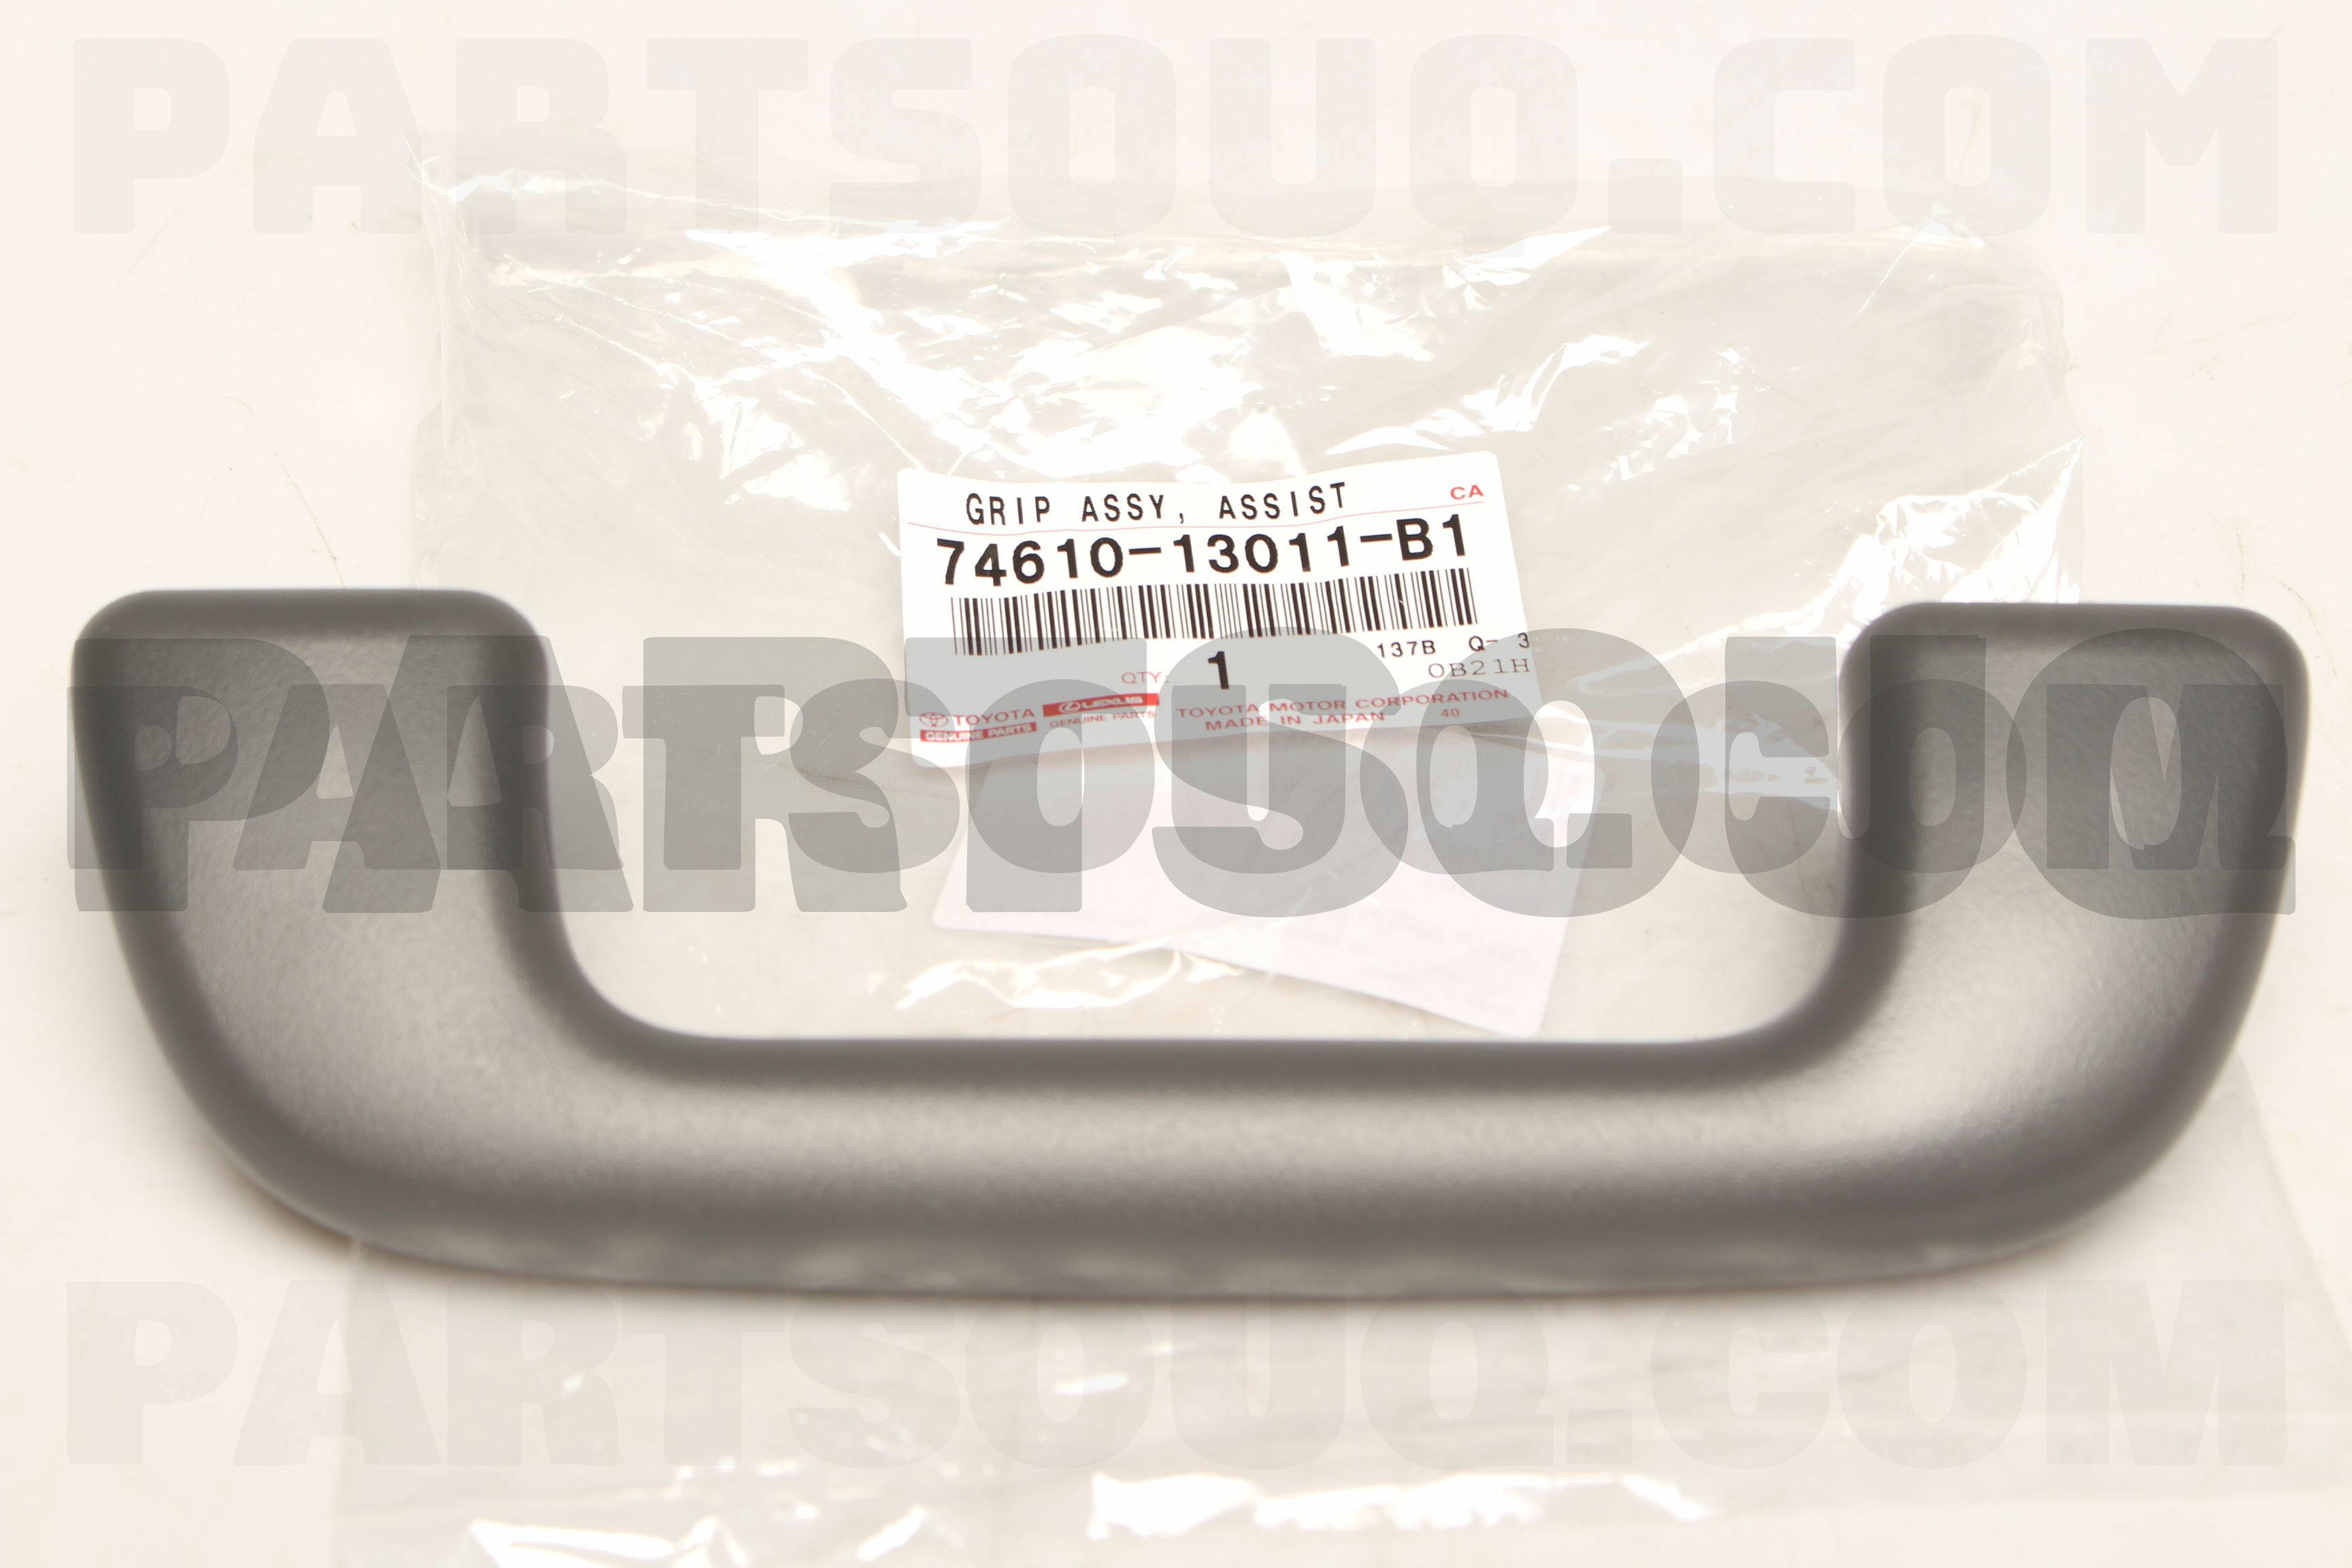 ASSIST 74610-13011-B1 7461013011B1 Genuine Toyota GRIP ASSY